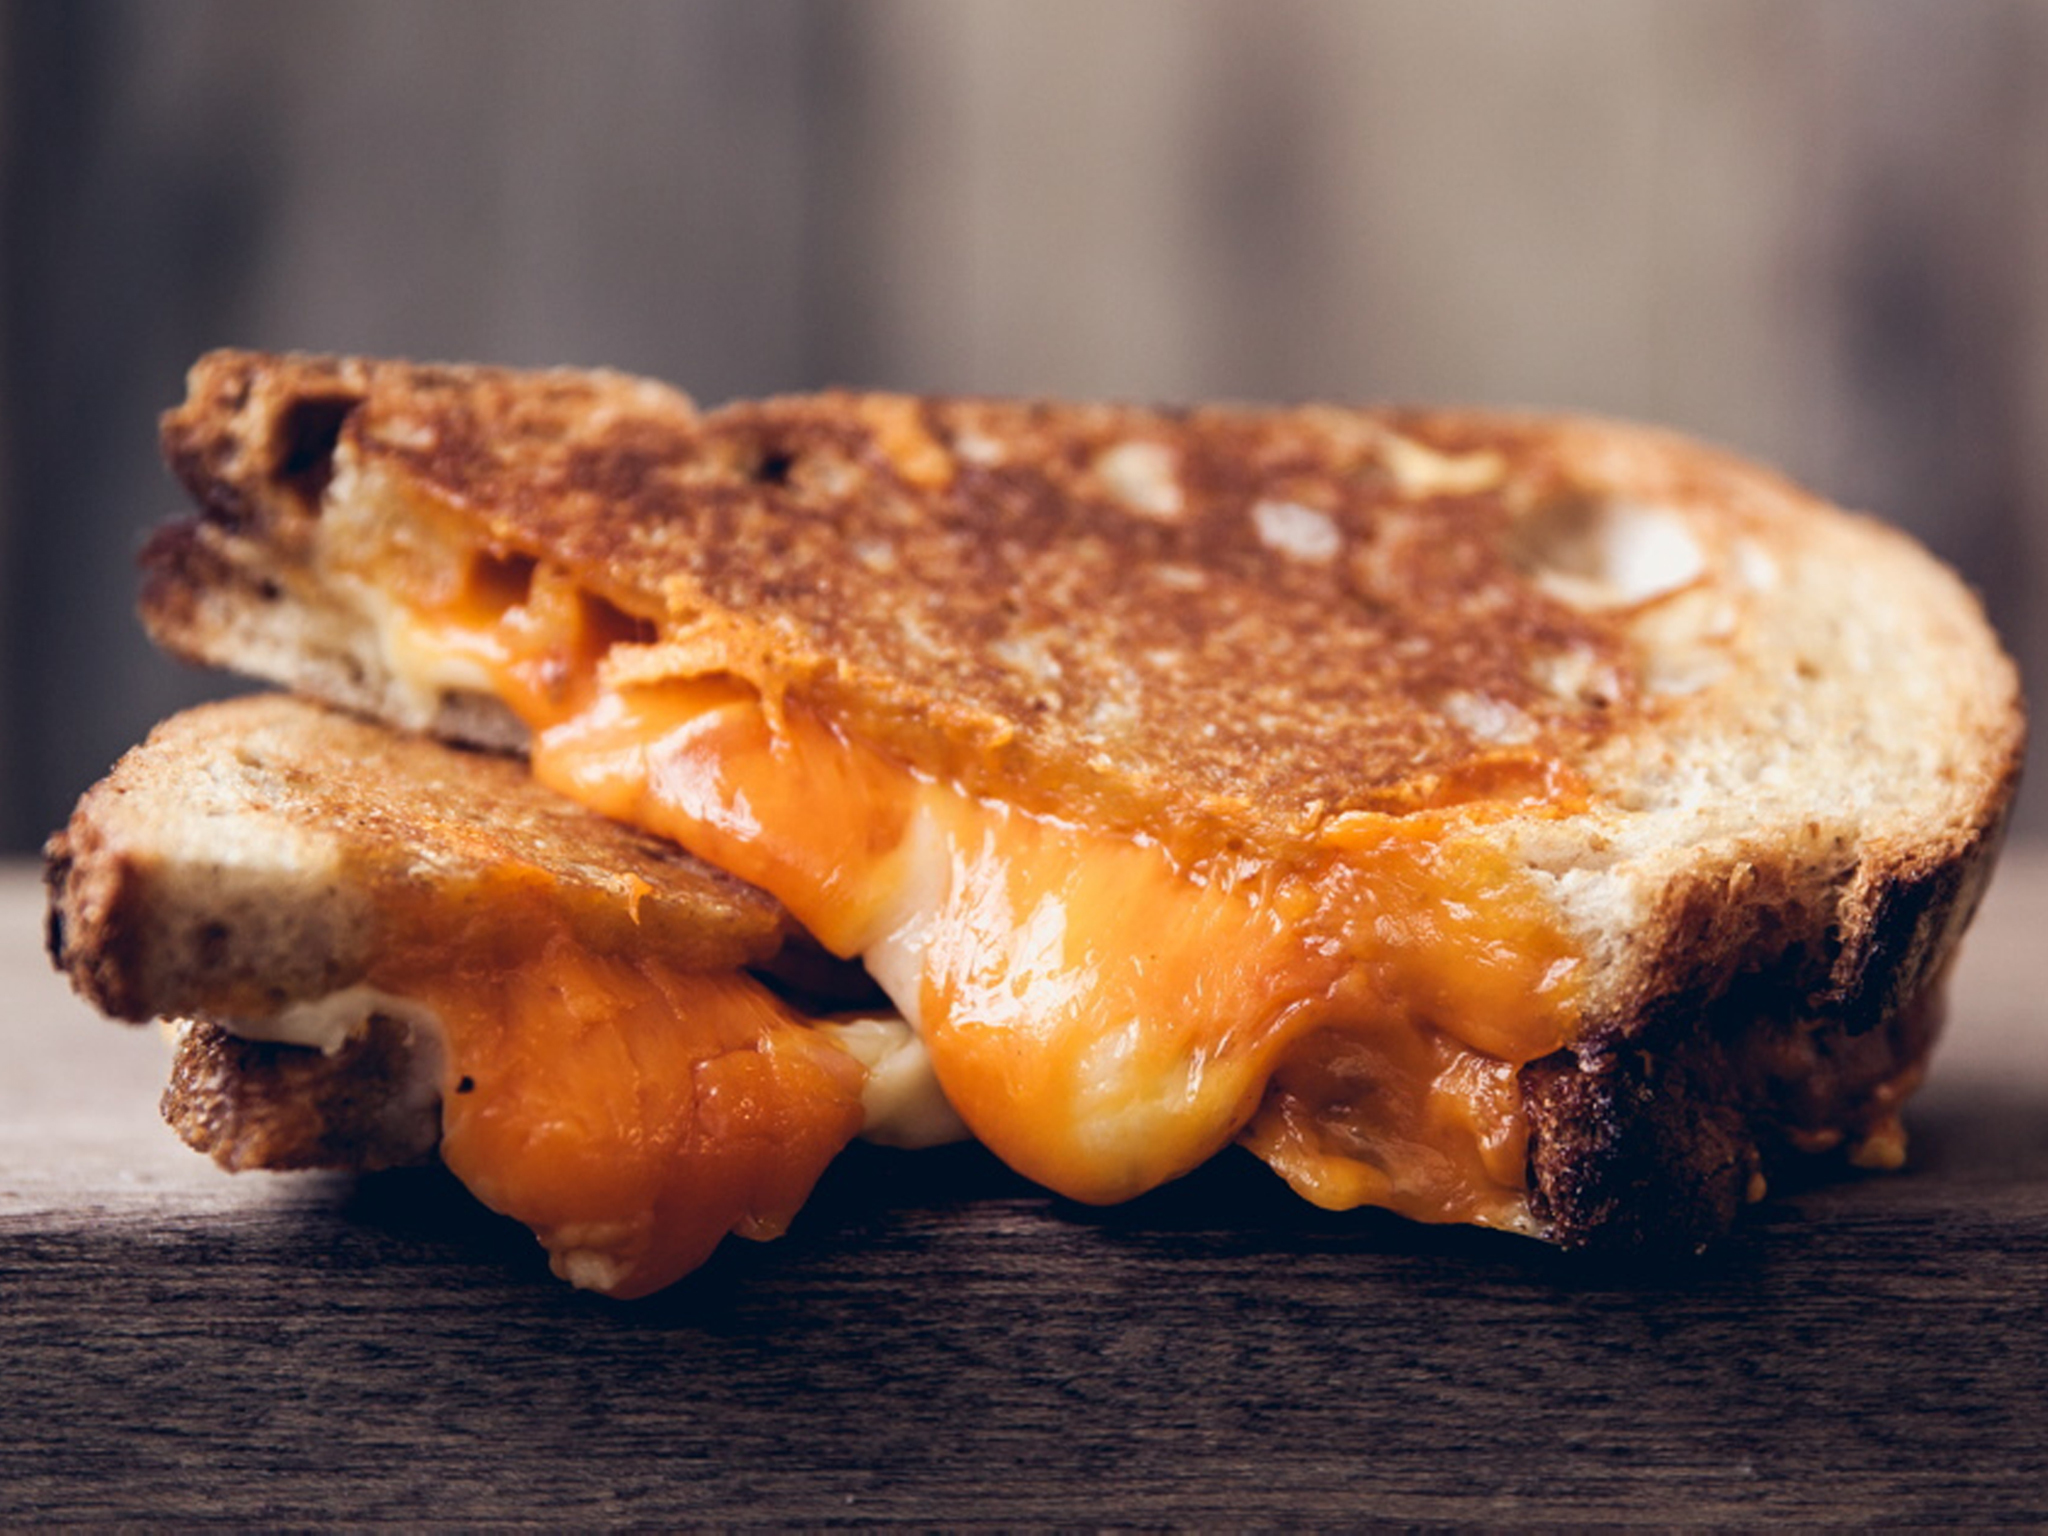 The 100 best cheap eats in London, Melt Room